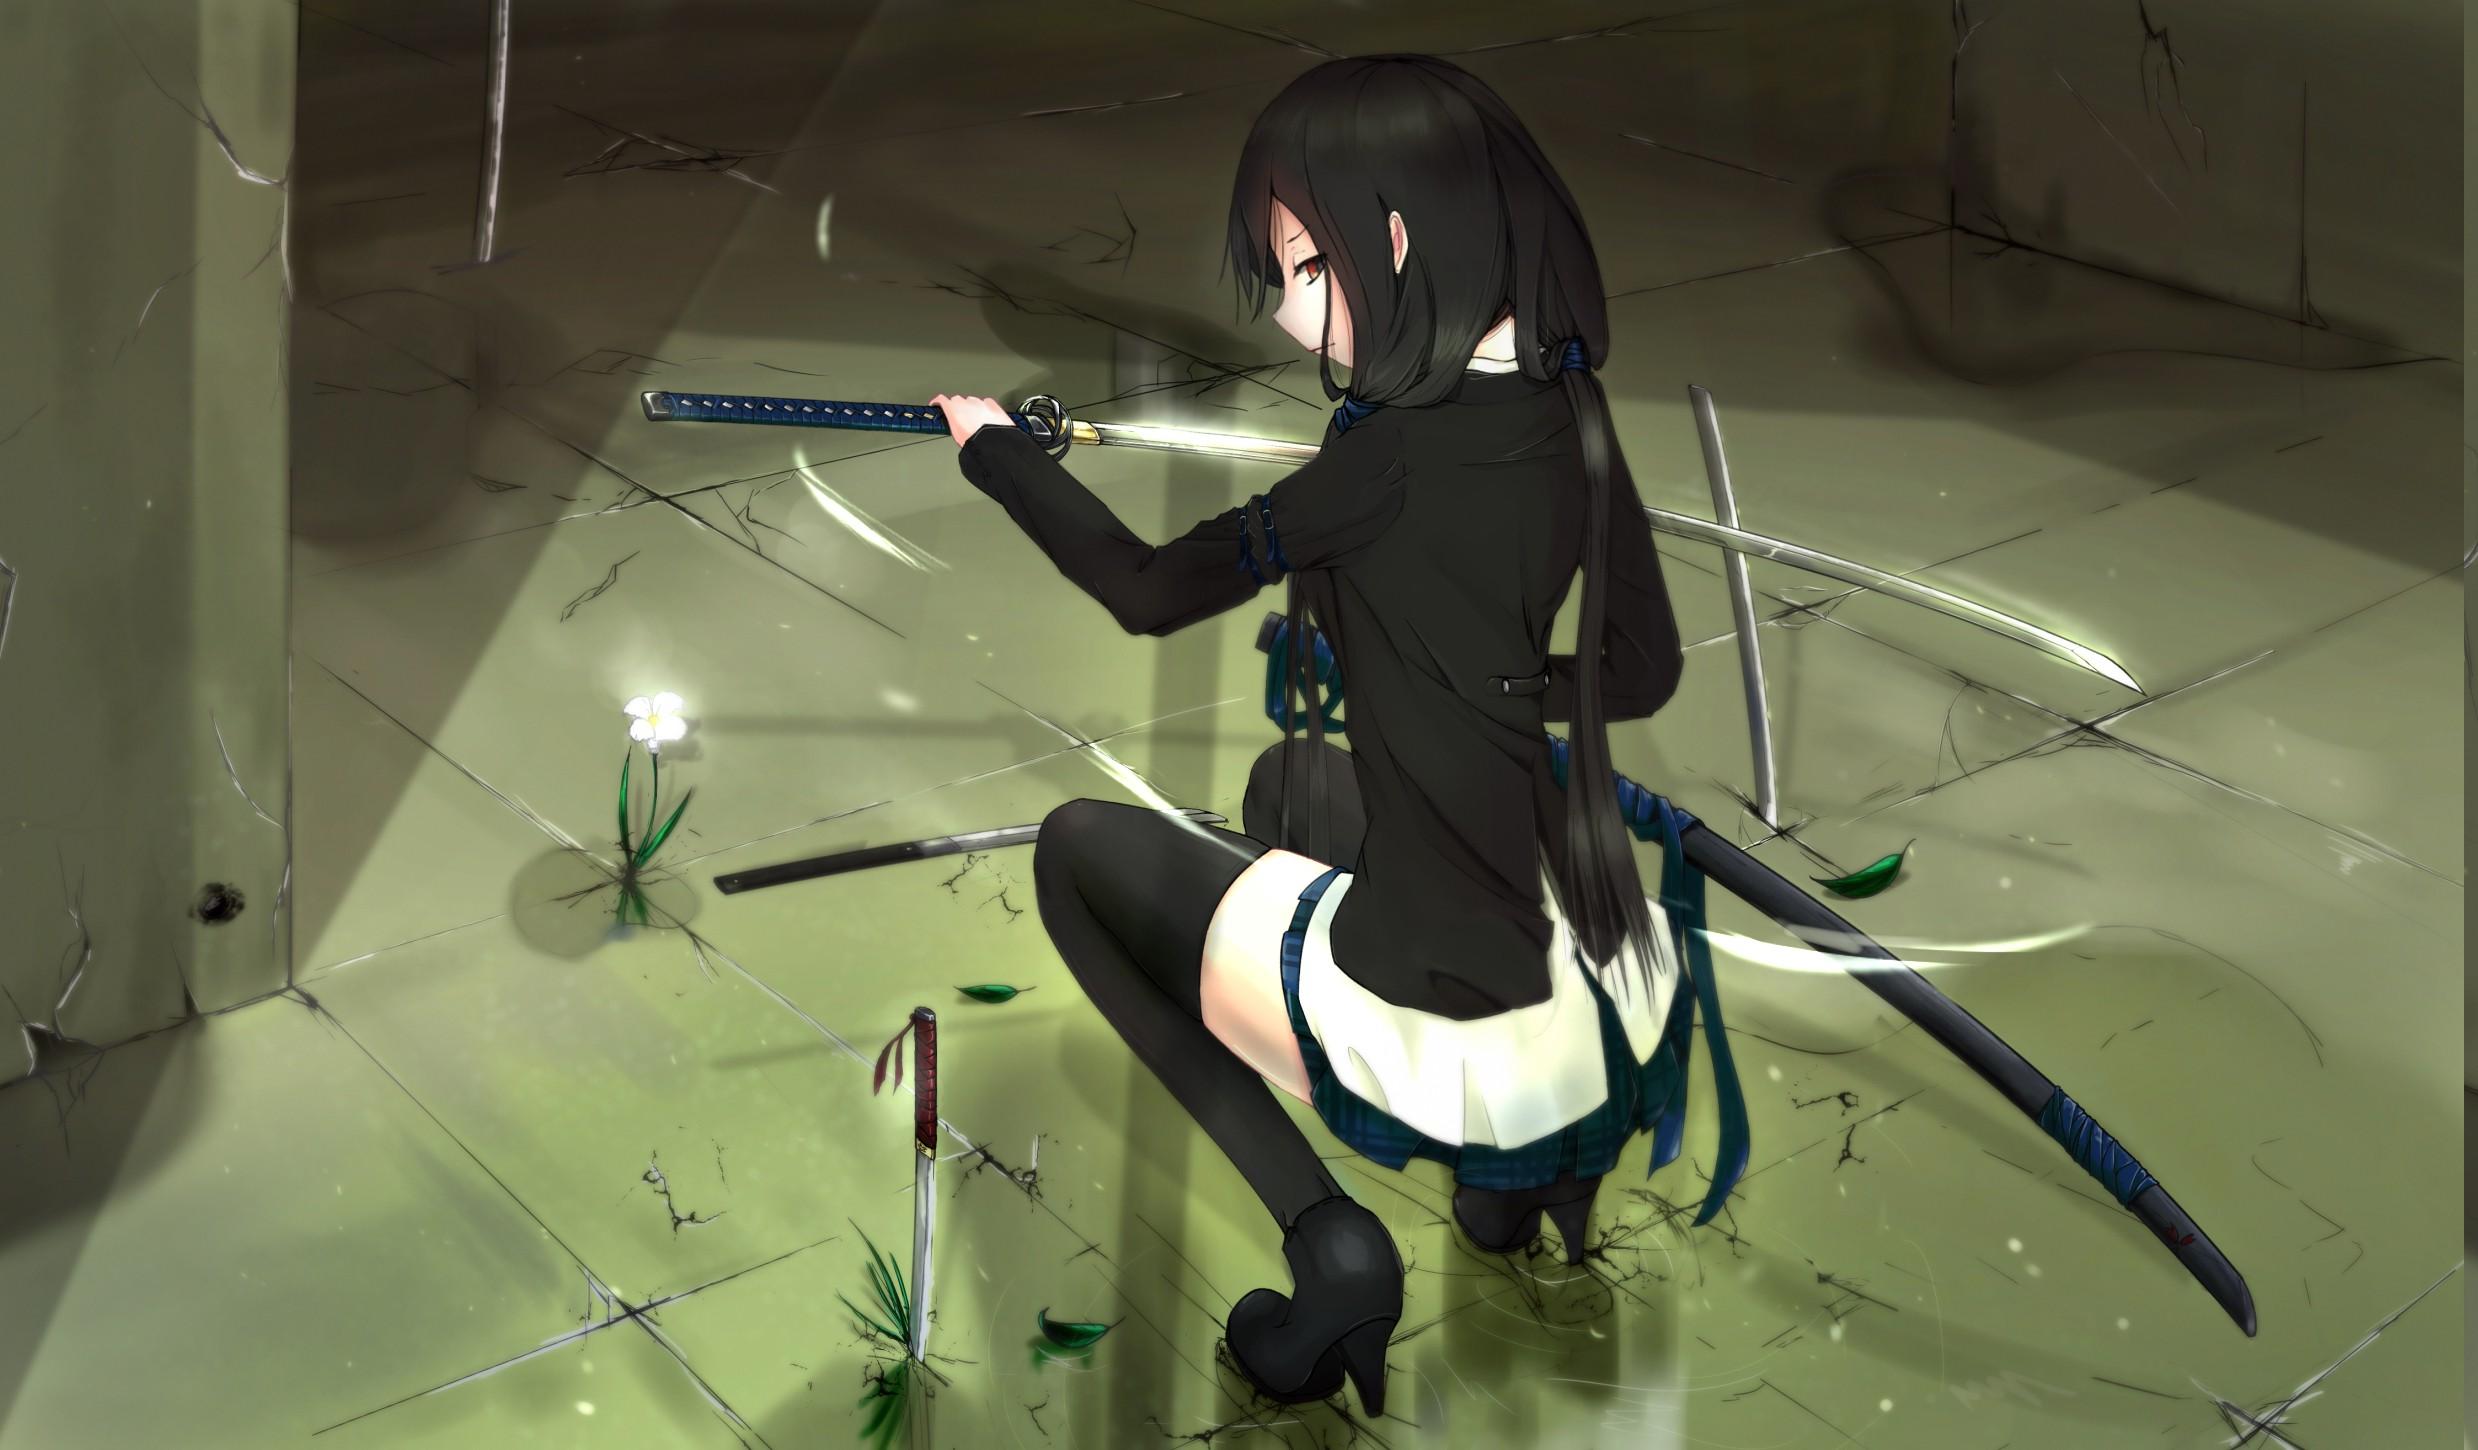 Wallpaper anime girls space stockings jacket black - Girl with sword wallpaper ...